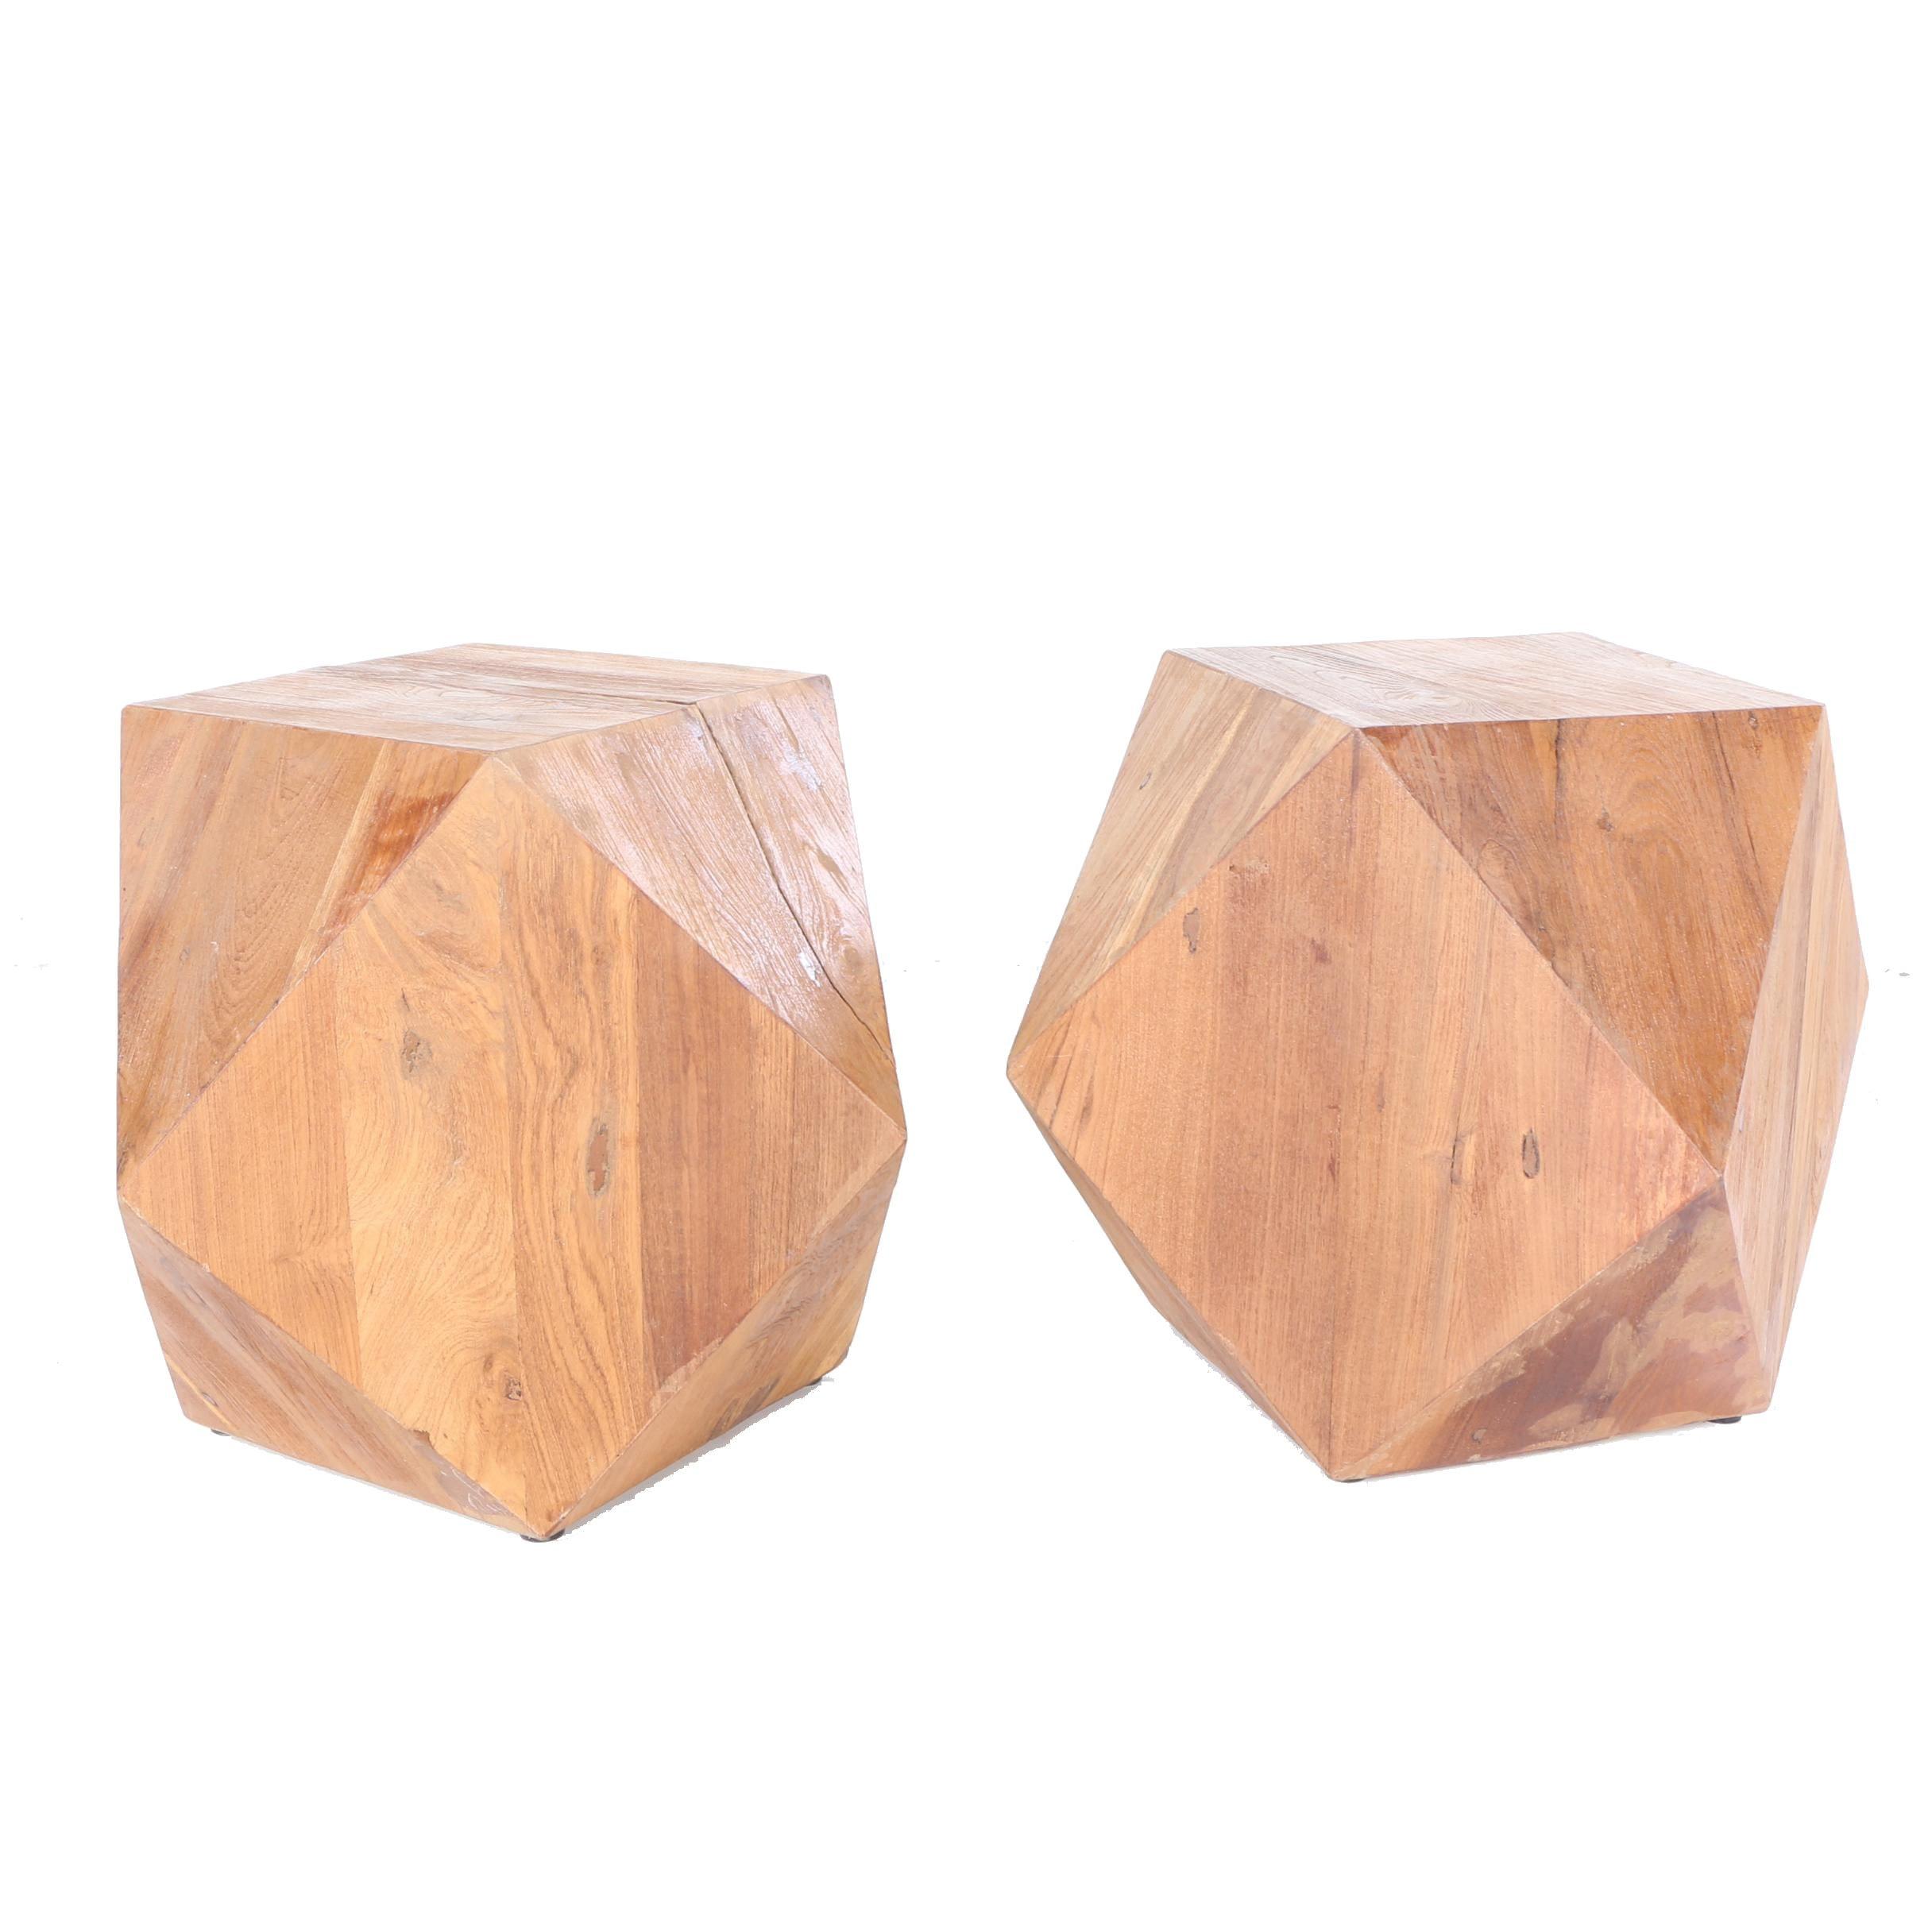 Pair of Geometric Cut Oak Side Tables